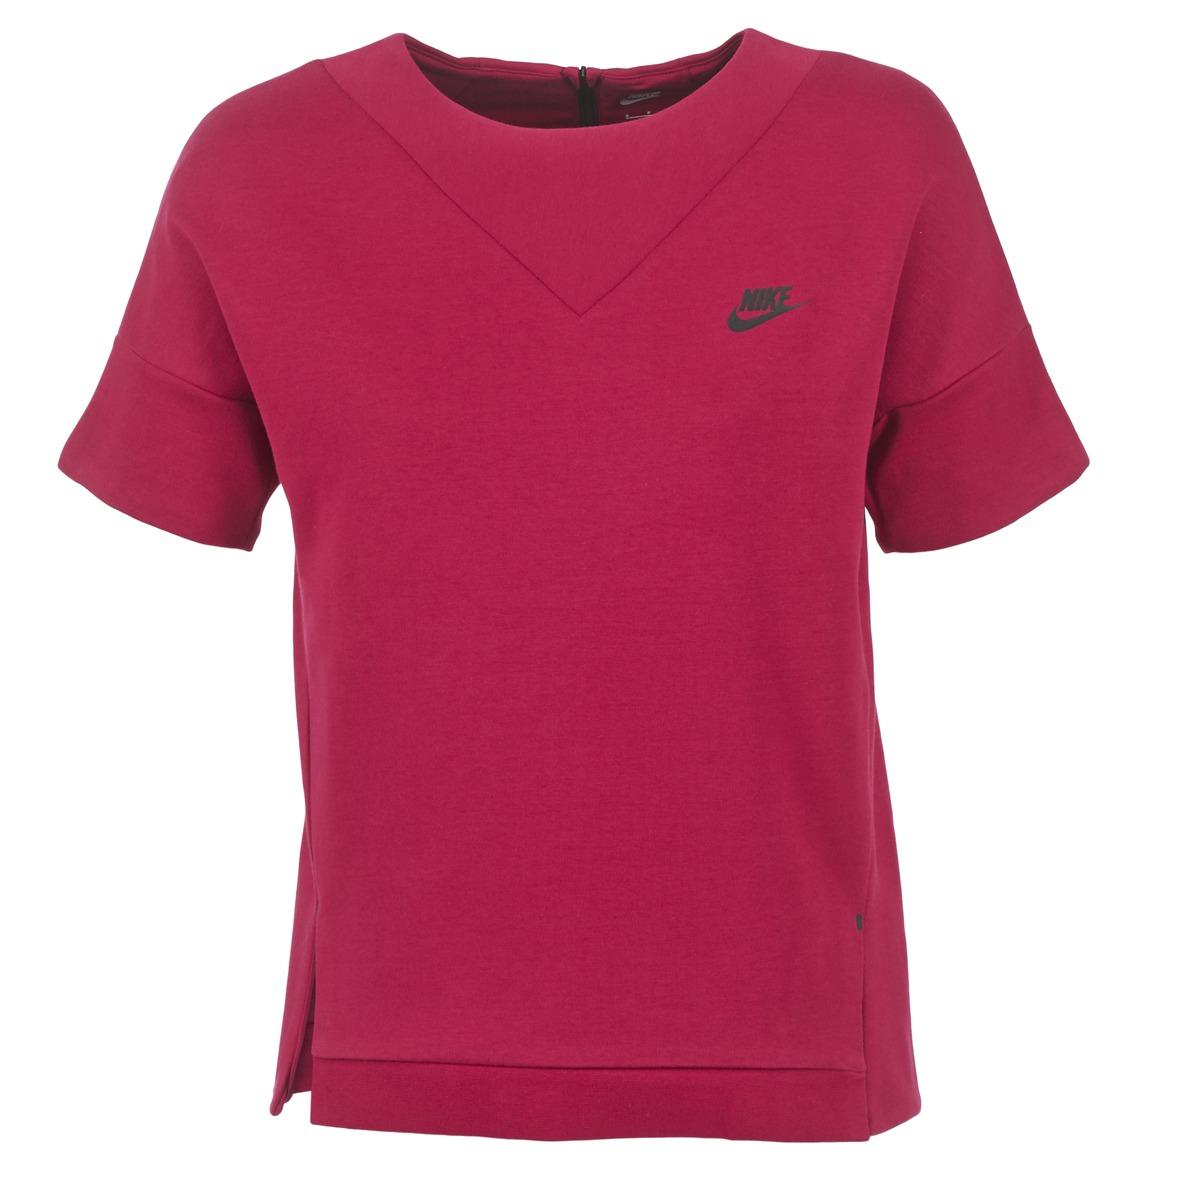 Nike TECH FLEECE CREW Bordeaux